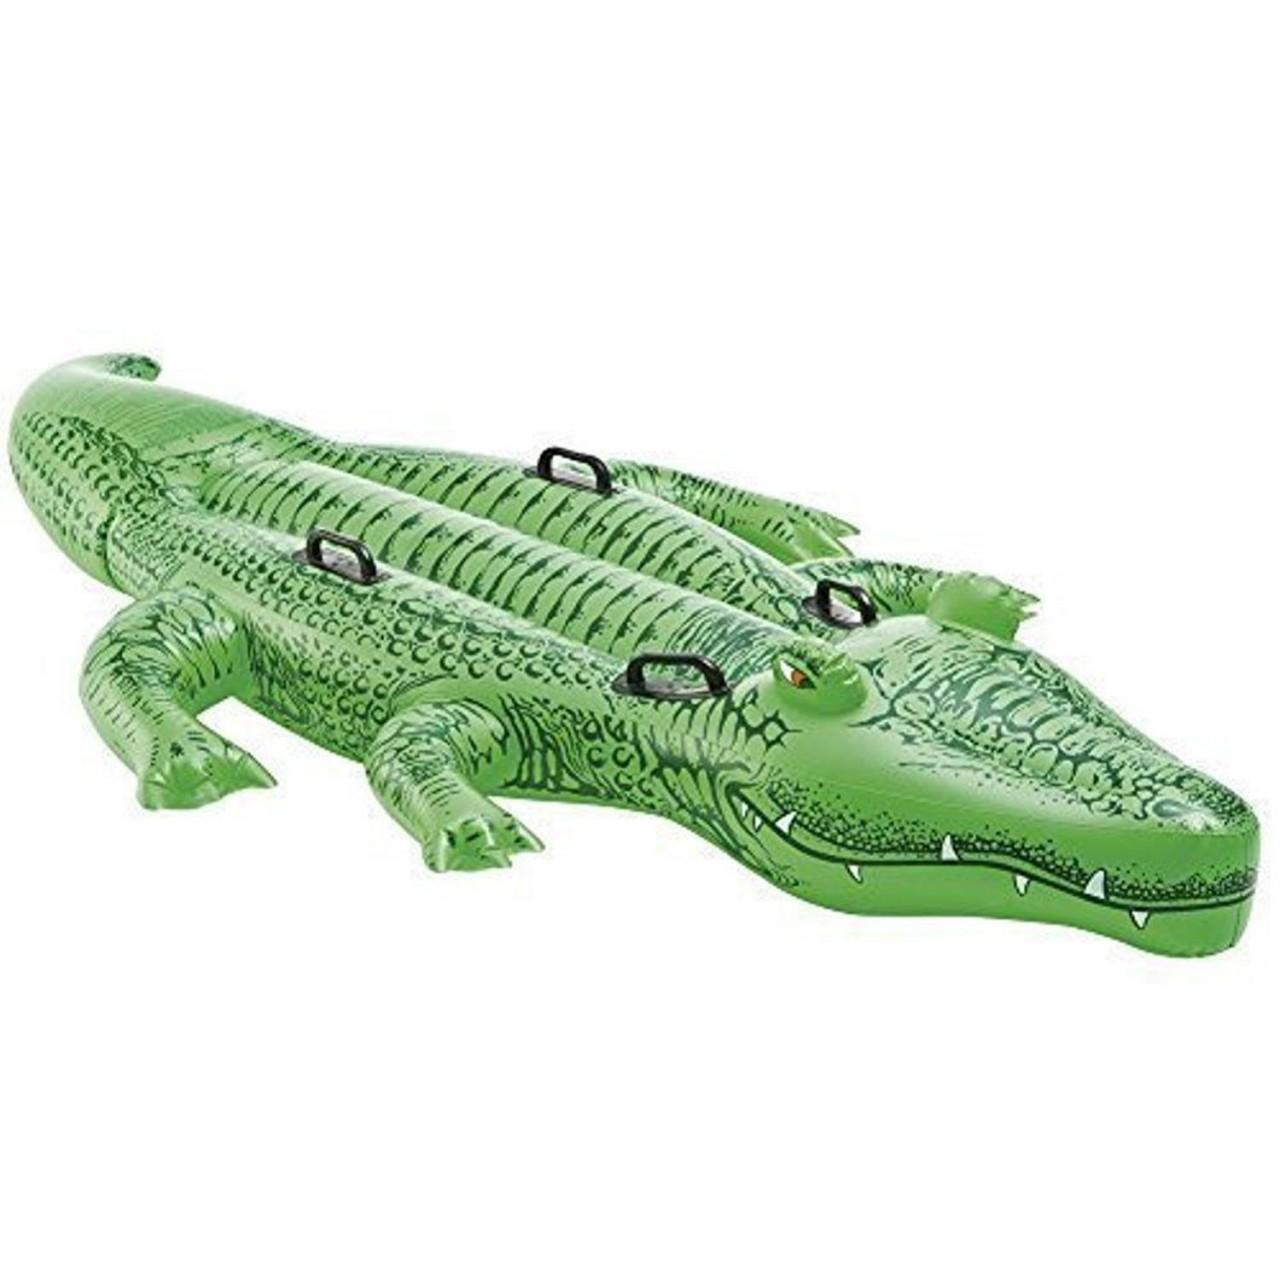 Intex Reittier Krokodil aufblasbar Luftmatratze 203 cm 58562